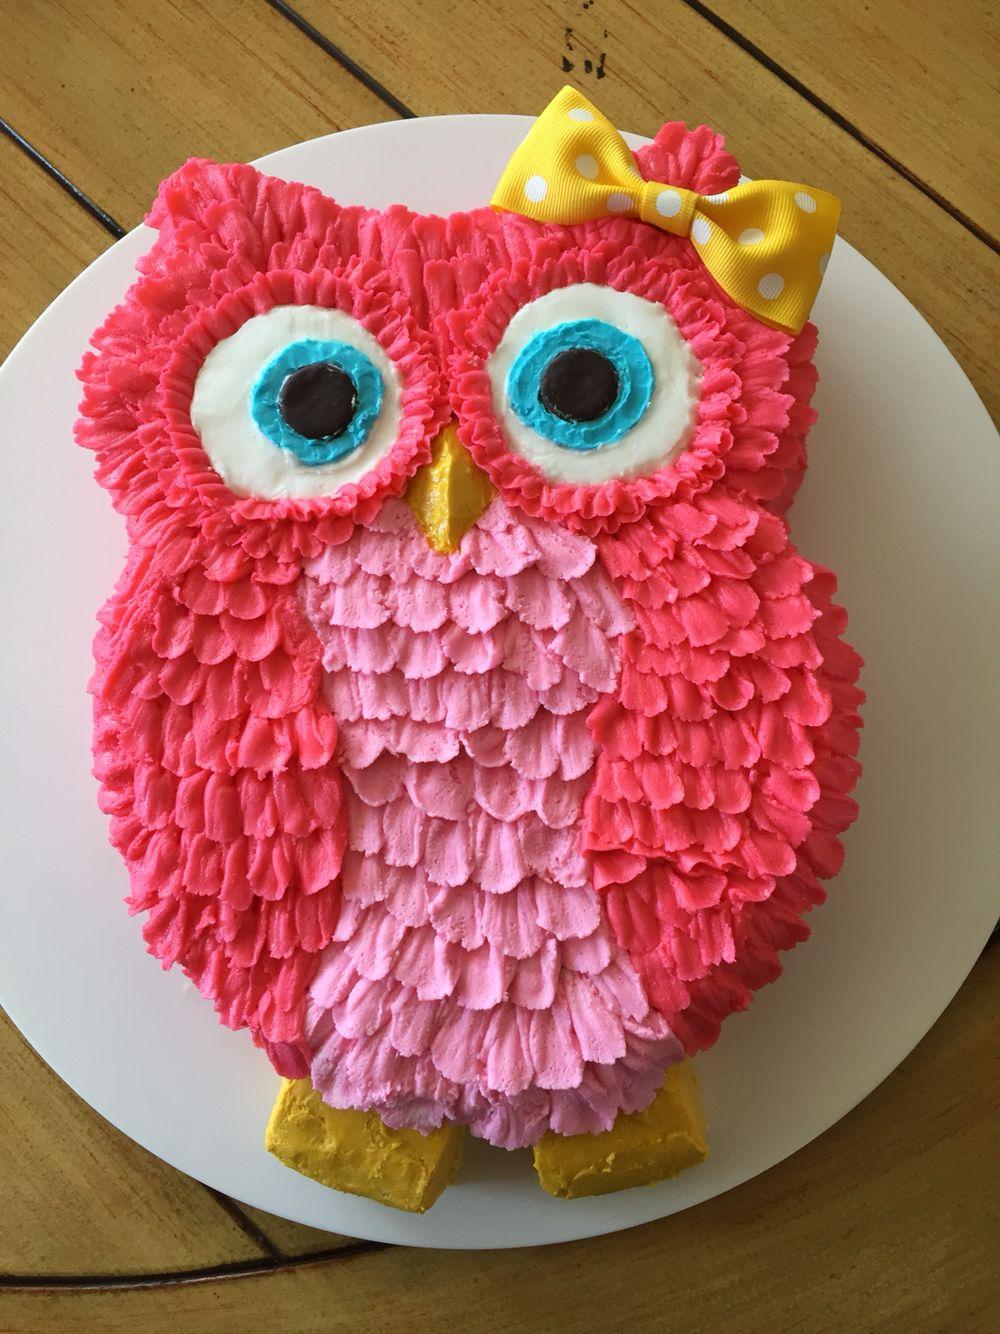 Fcfbccadedecfccdajpg  Size Of Owl - Owl percy pig birthday cake